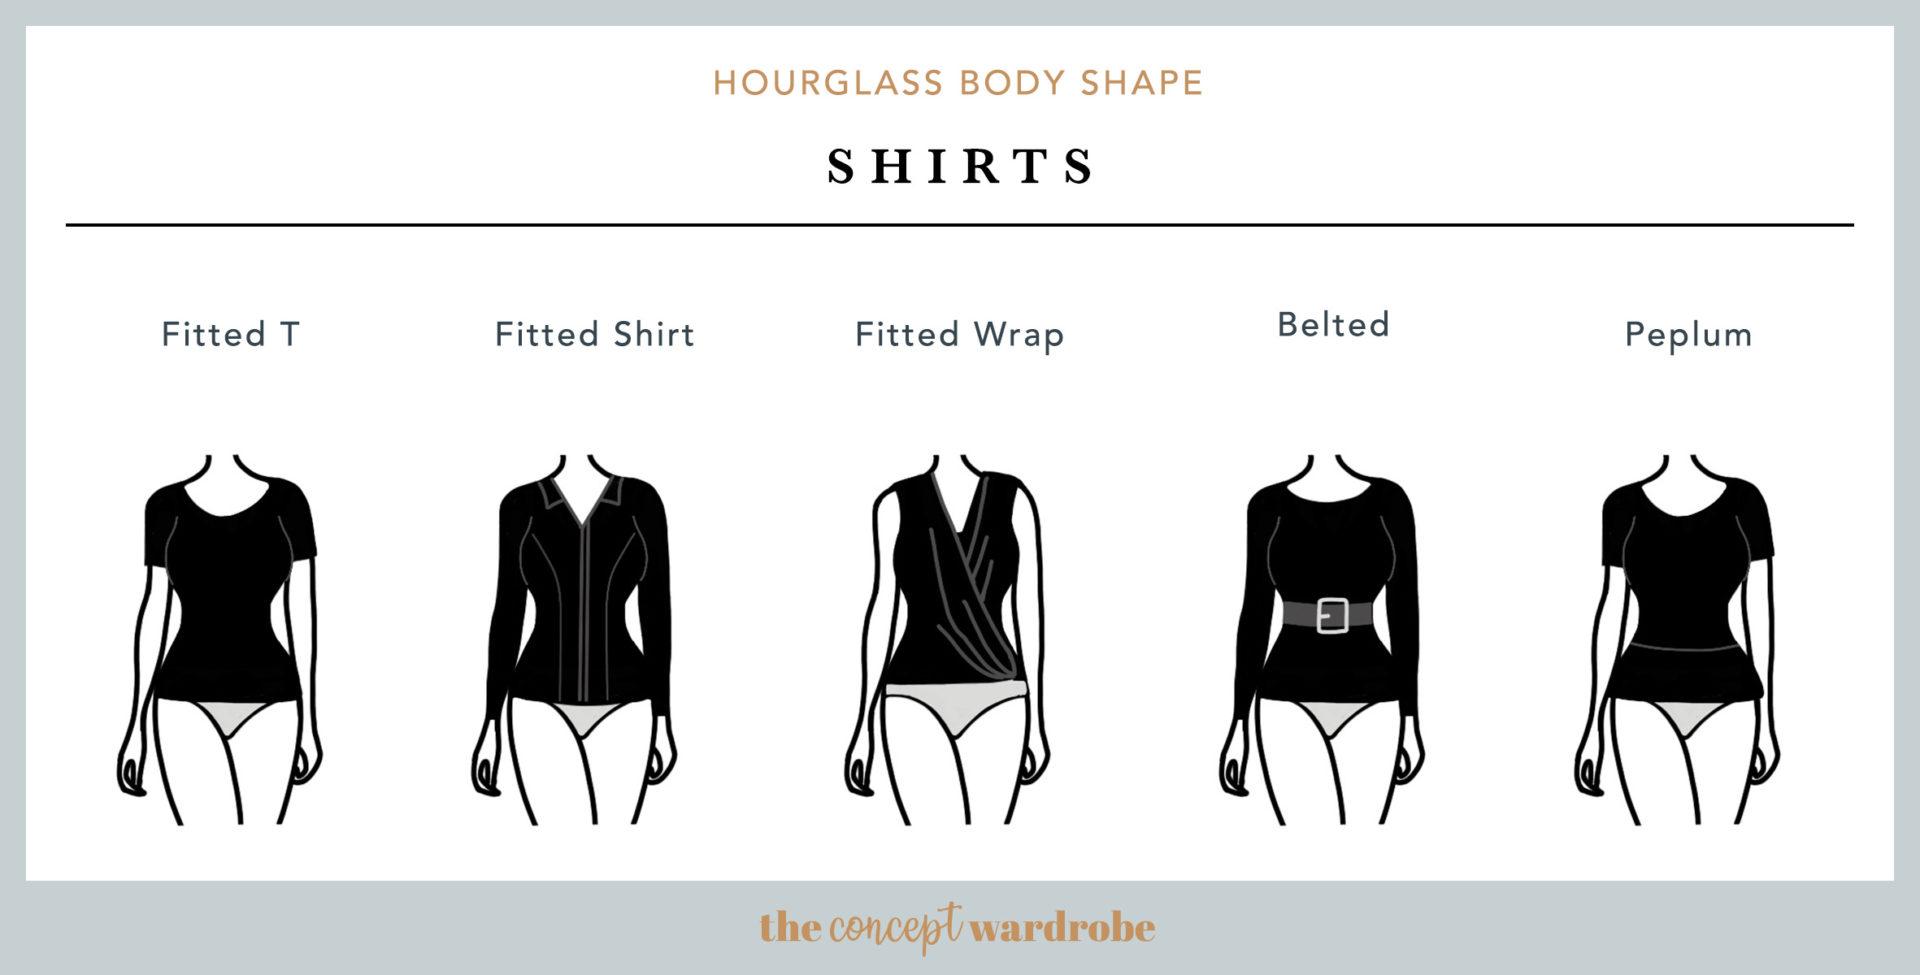 Hourglass Body Shape Shirts - the concept wardrobe